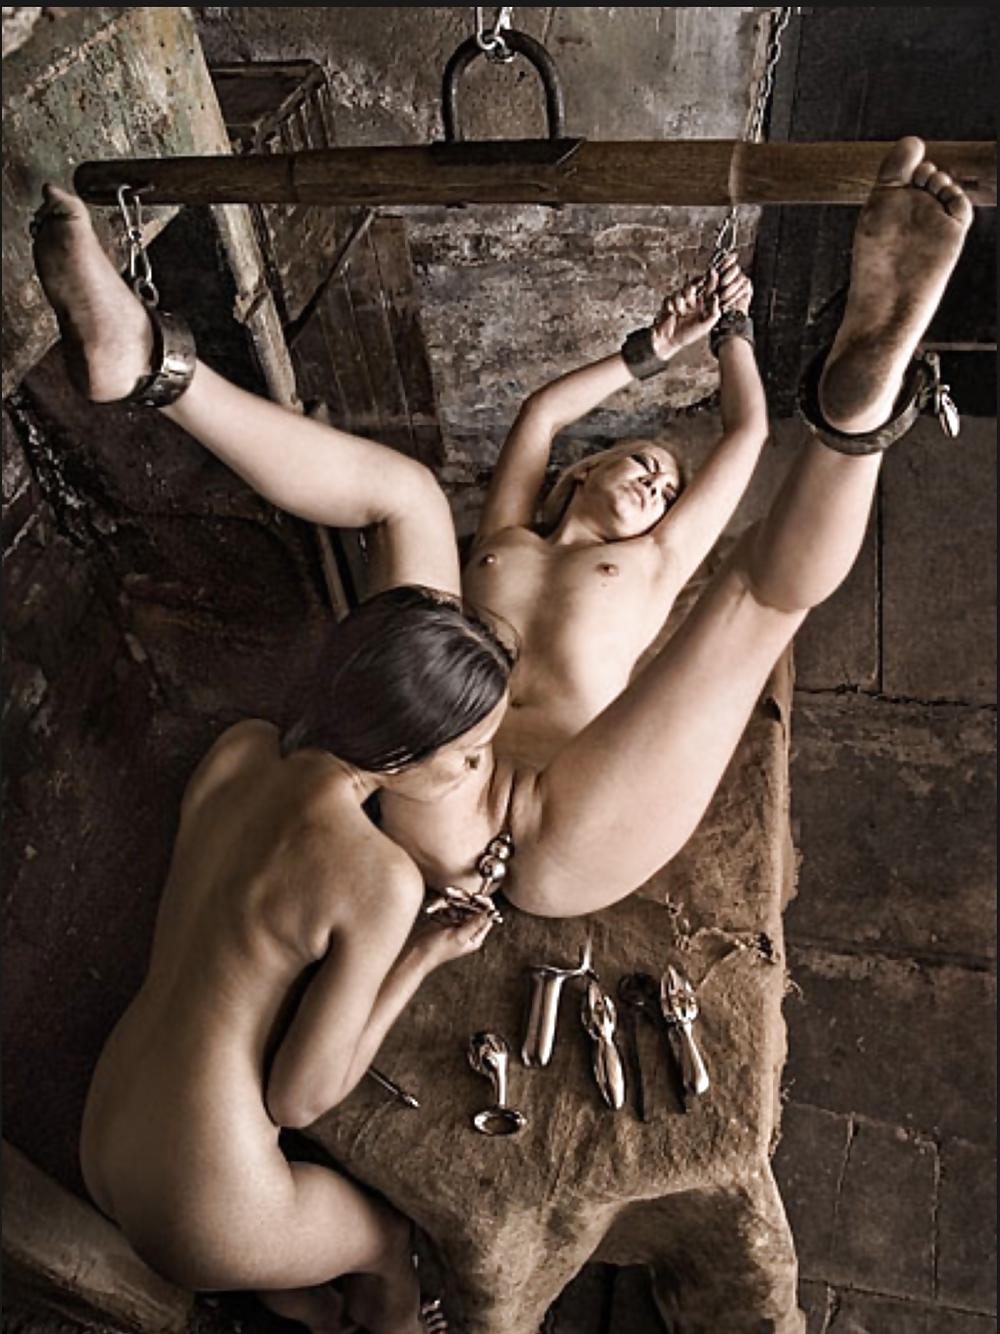 Lesbian beach bondage, really nice body nude